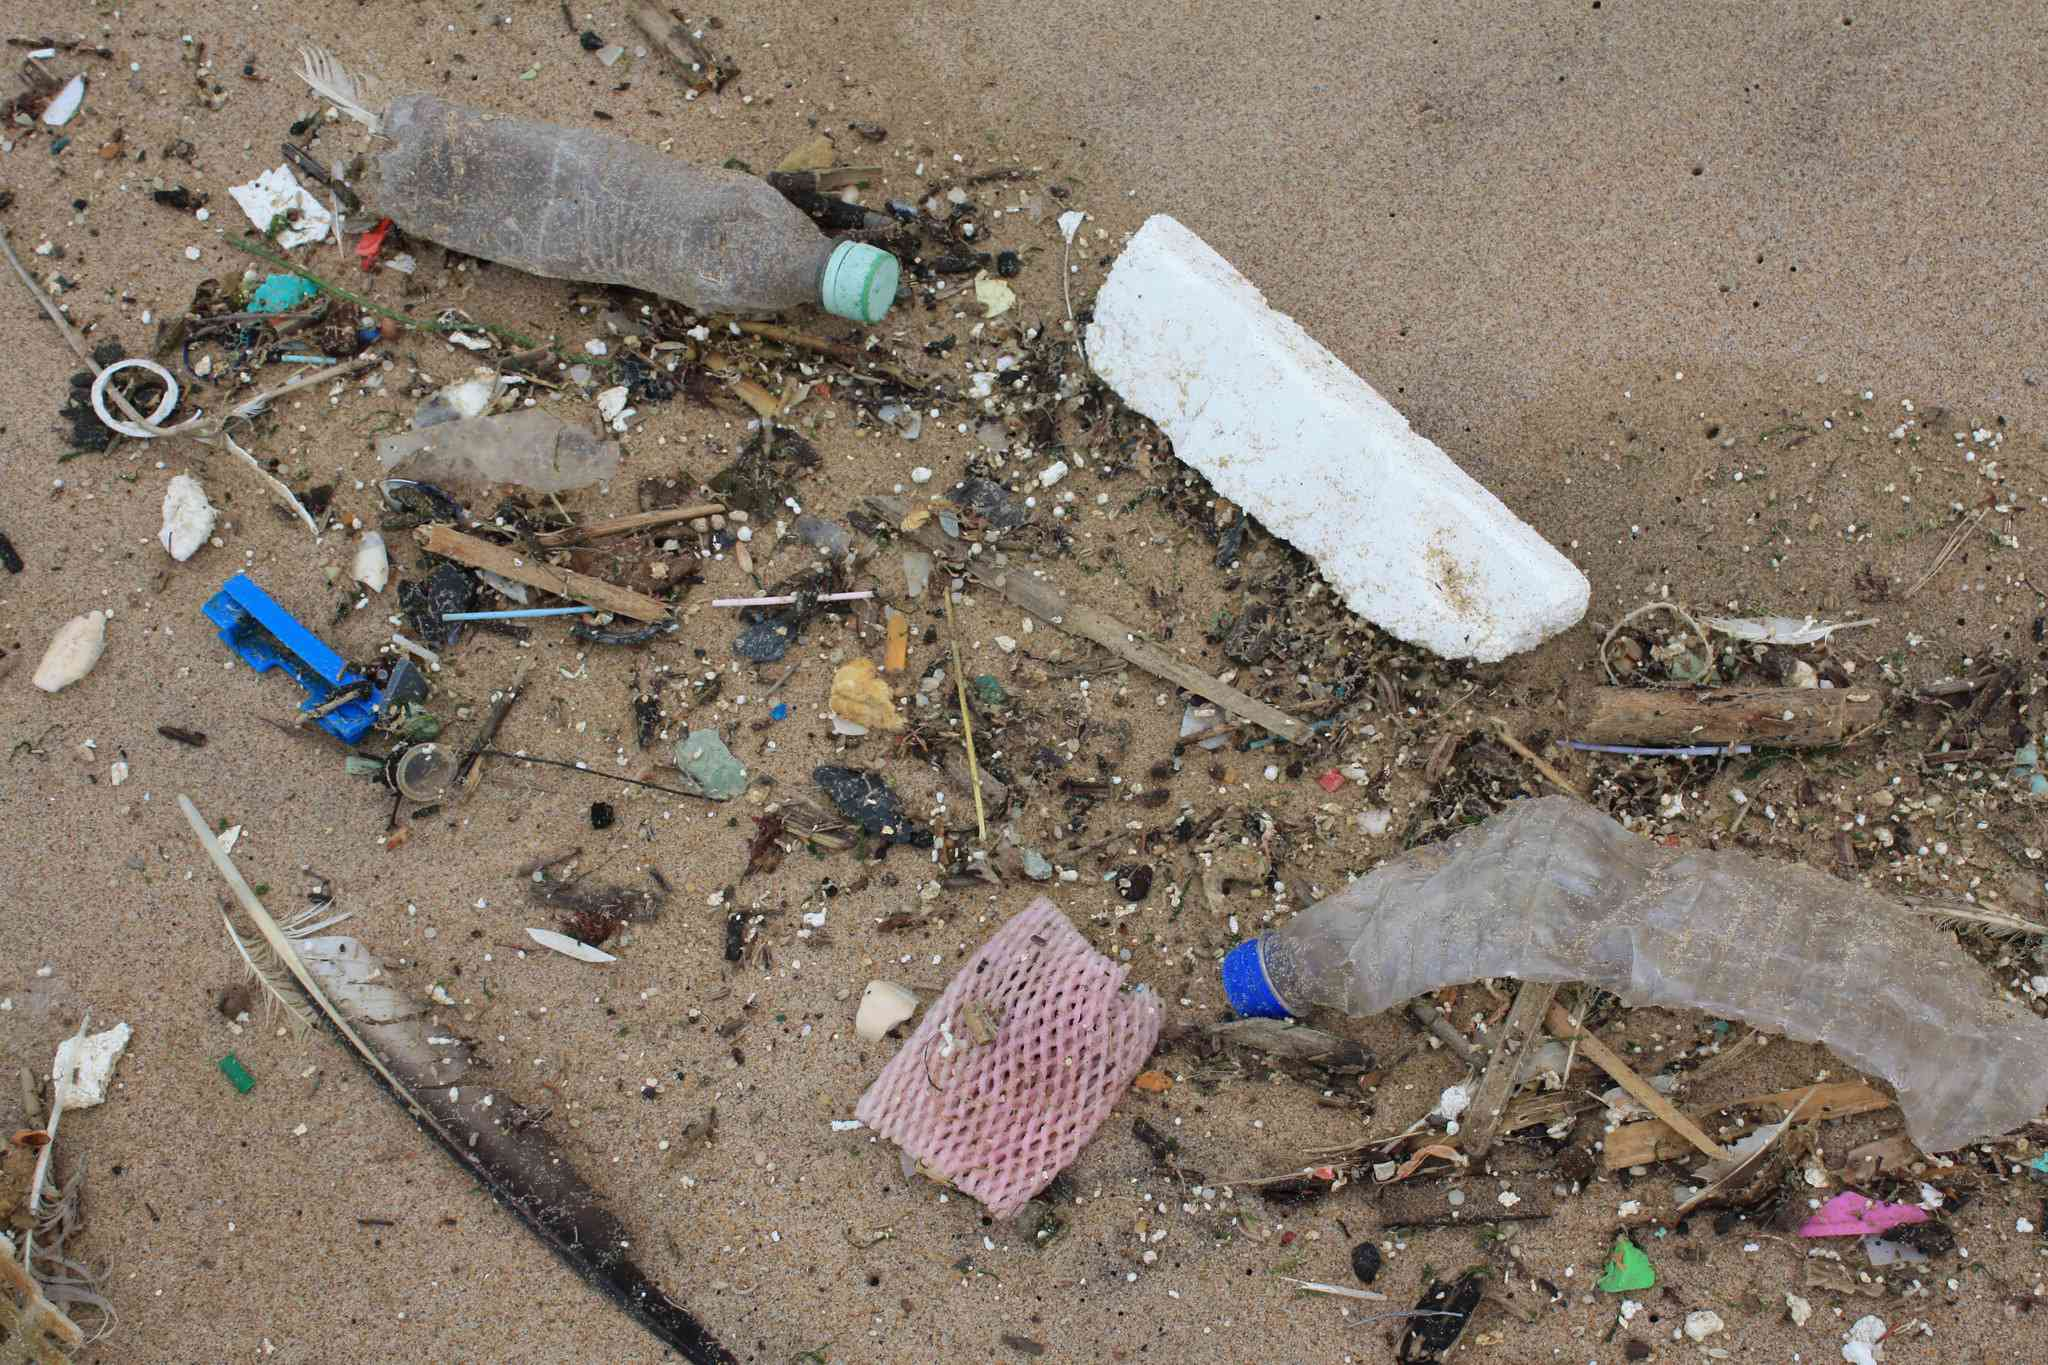 plastic cotton bud sticks, plastic bottles, and other plastic beach debris